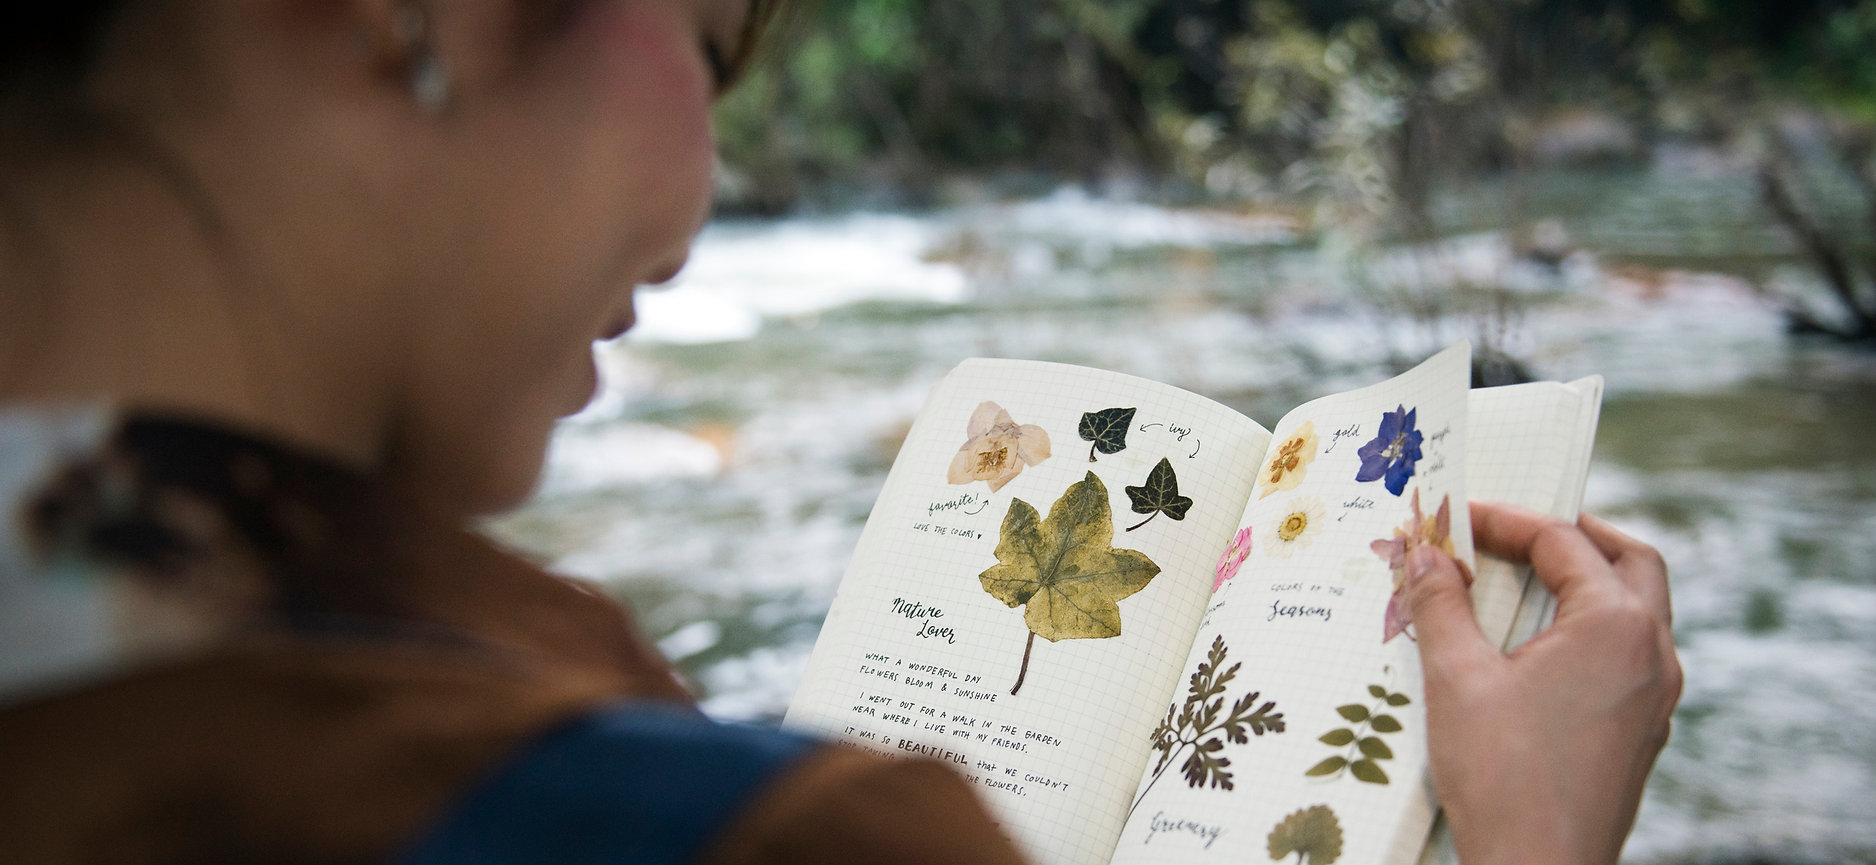 Environmental Education Curriculum Desig